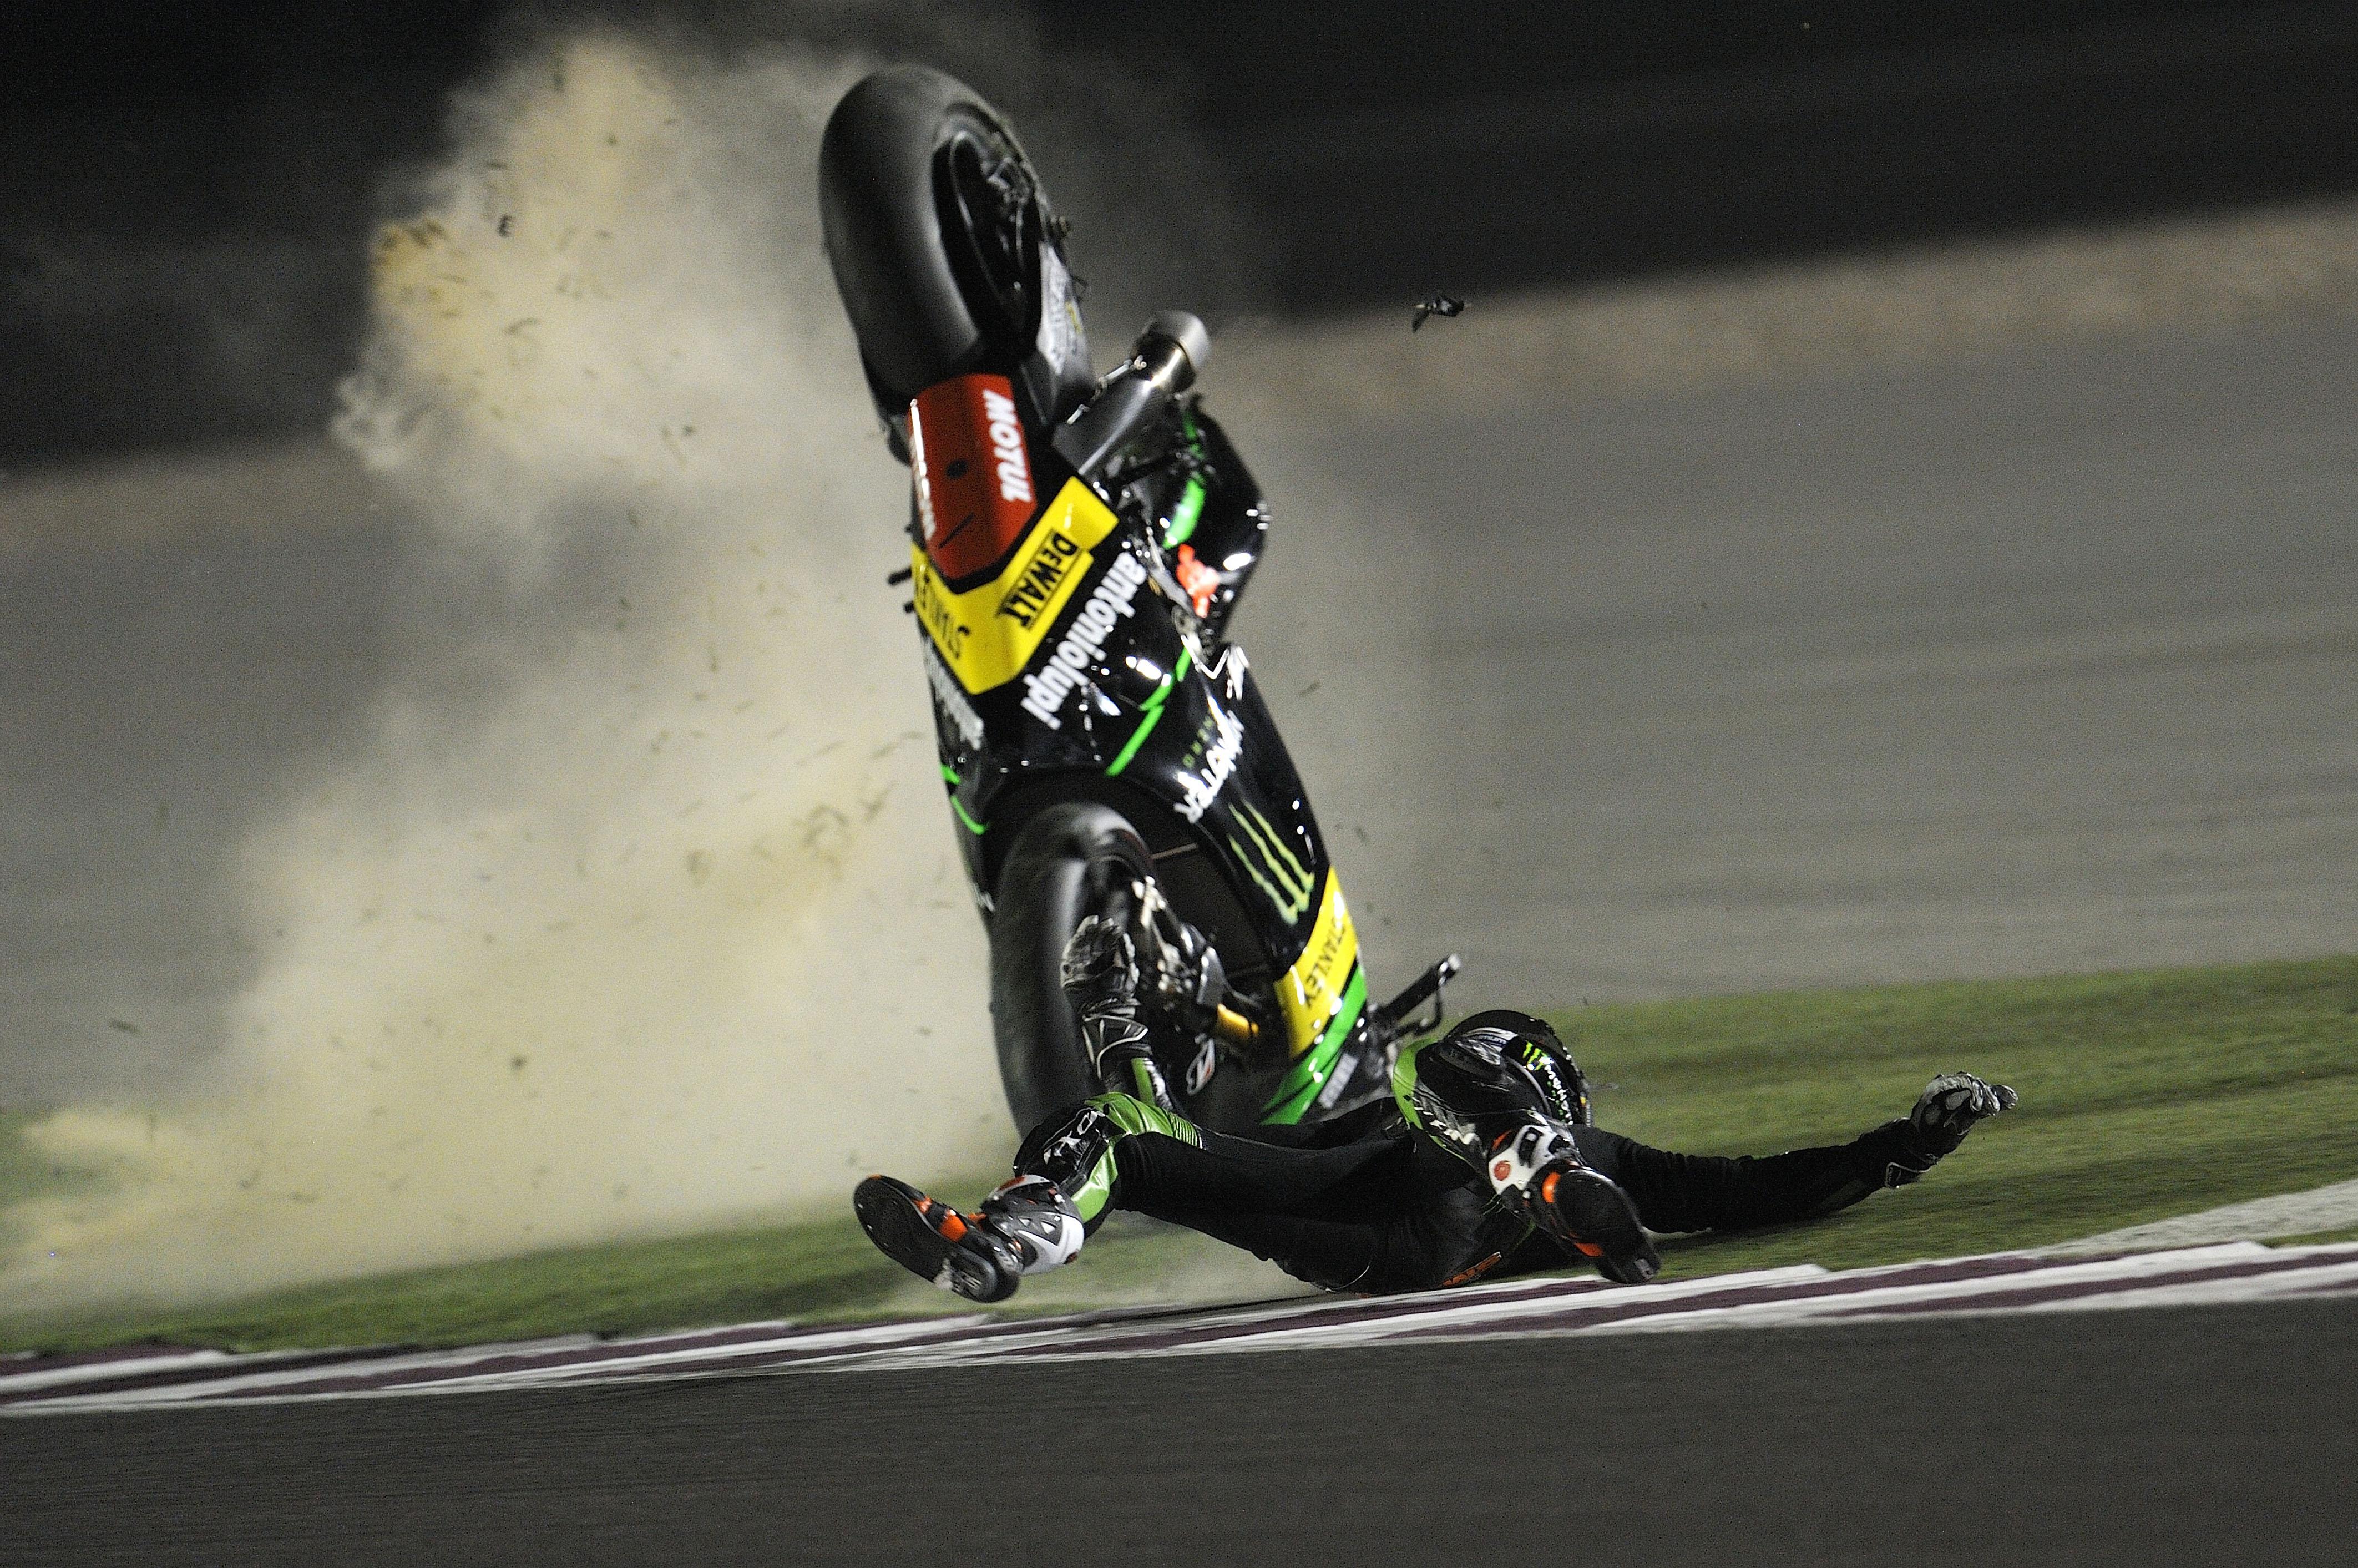 MotoGP 2014: Championship standings after Qatar